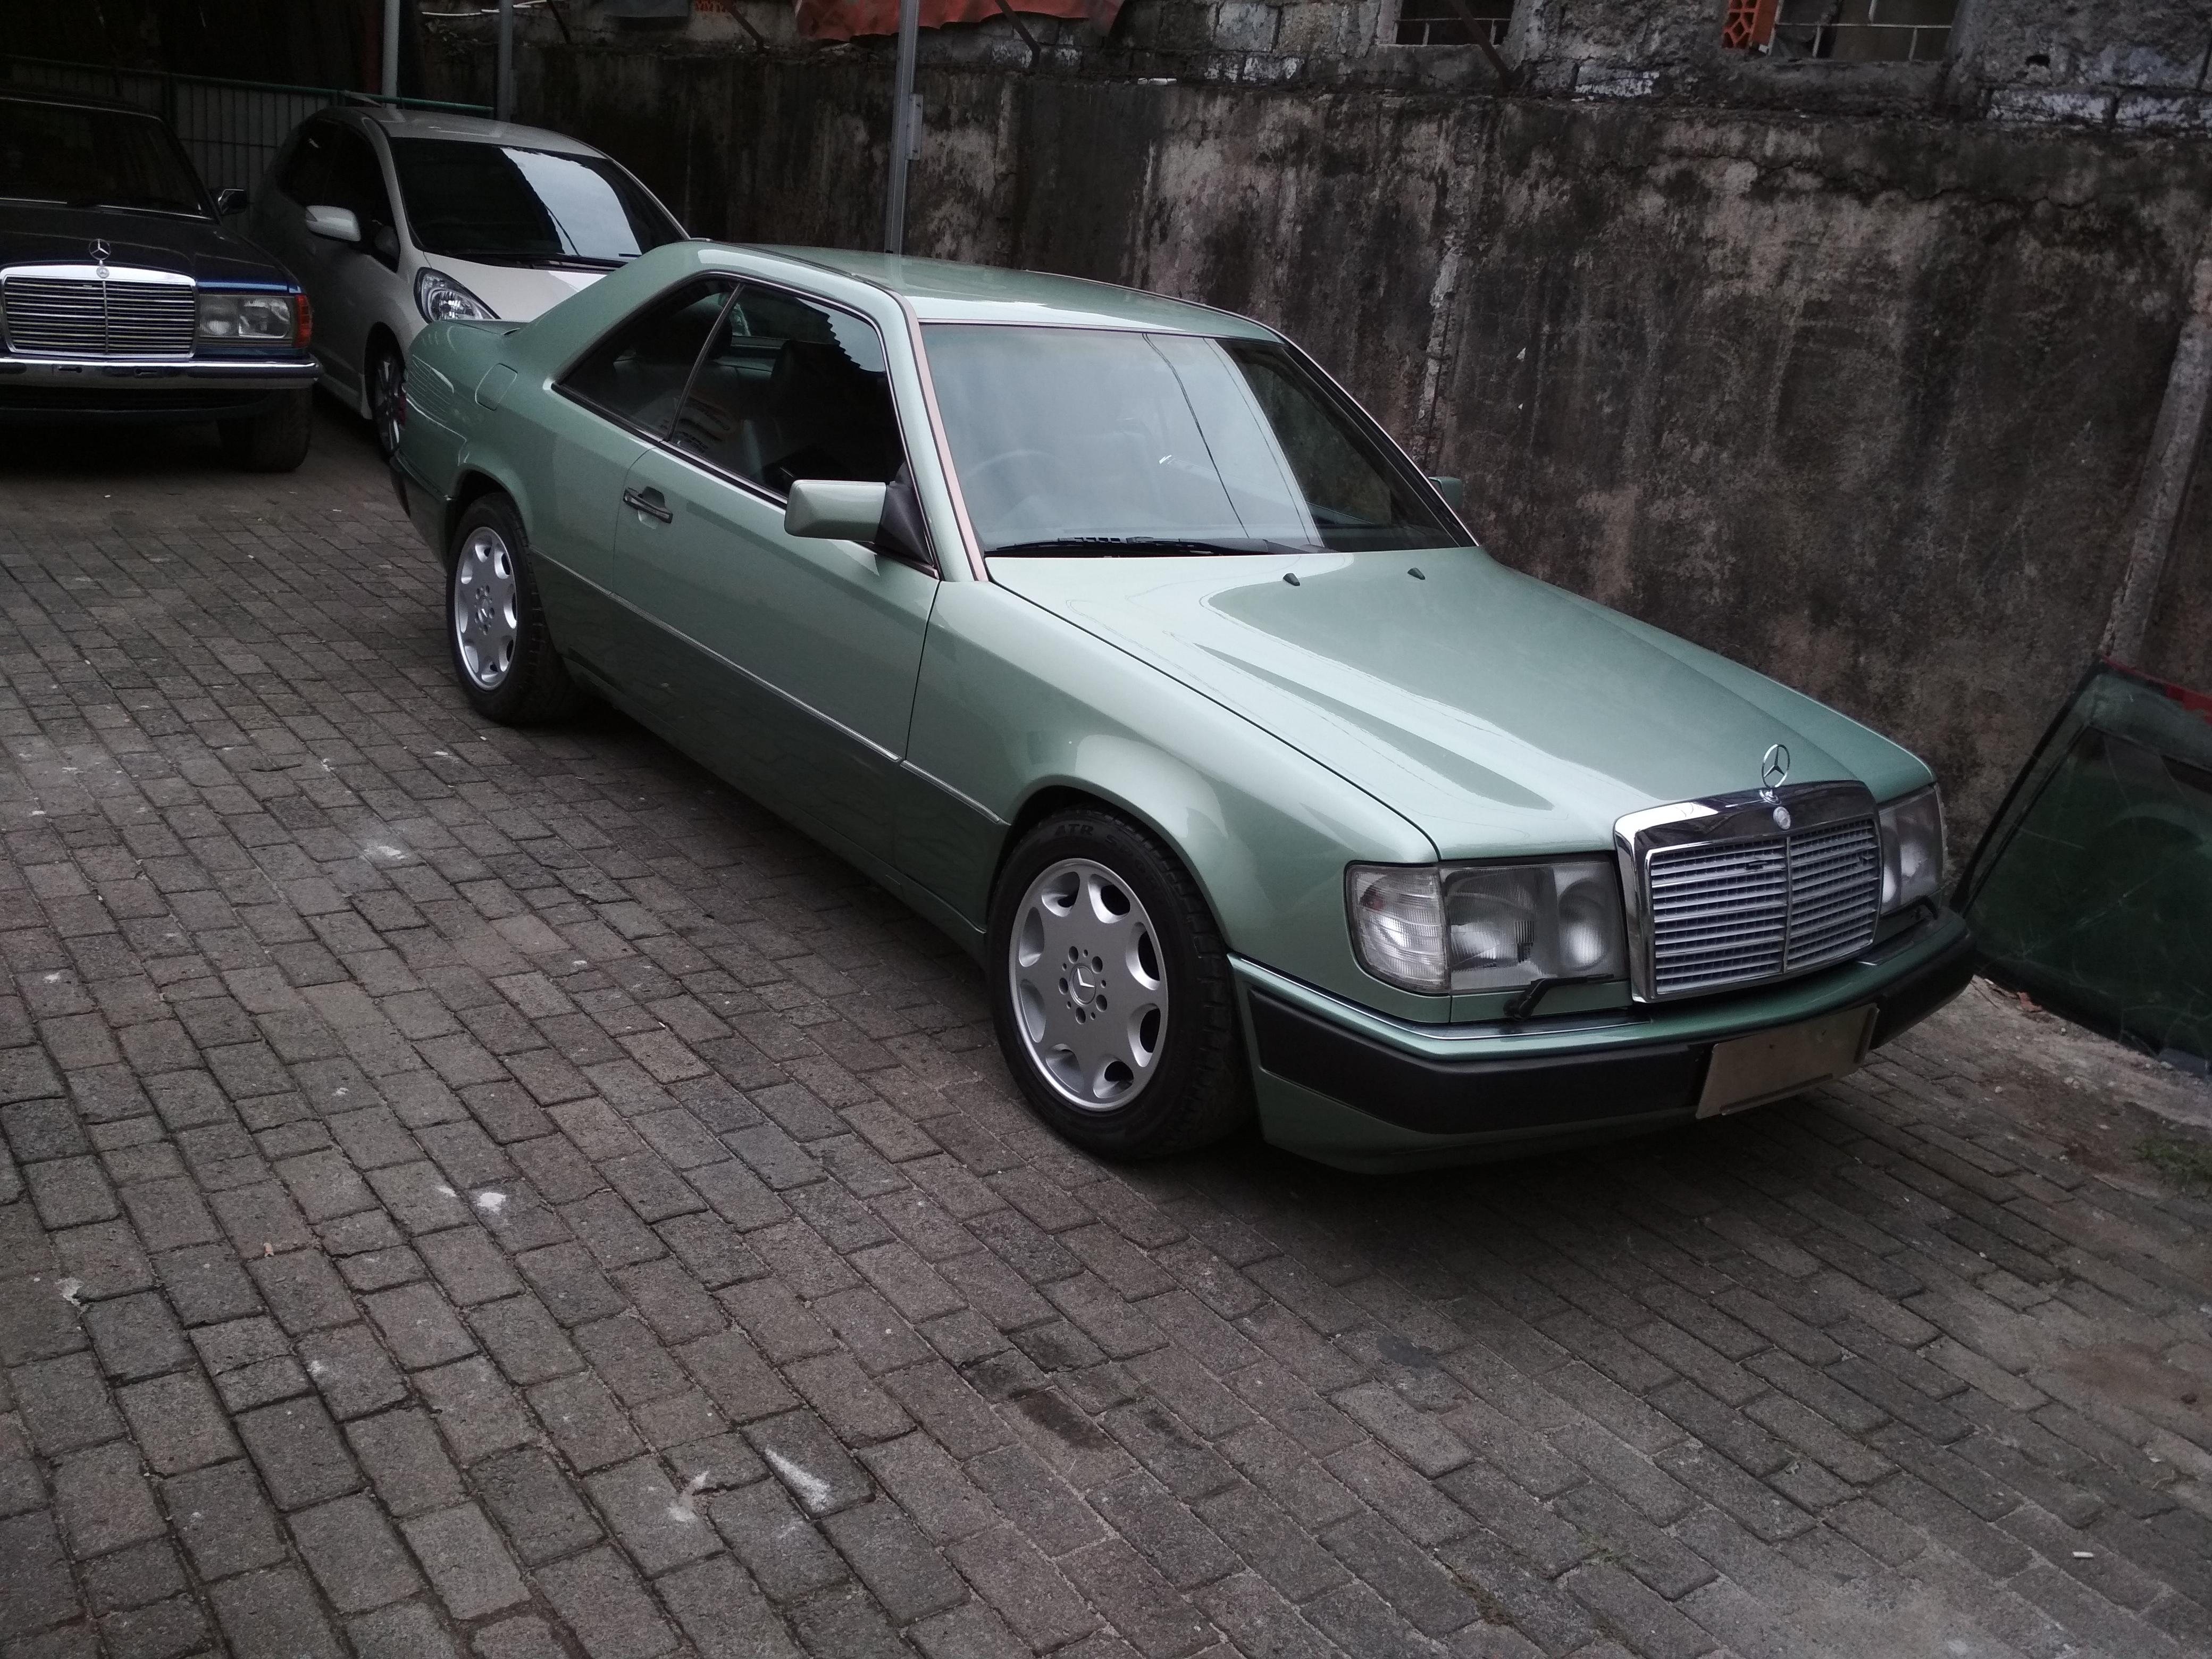 1991 mercedes benz 300ce w124 garasi 64 for Mercedes benz 300ce